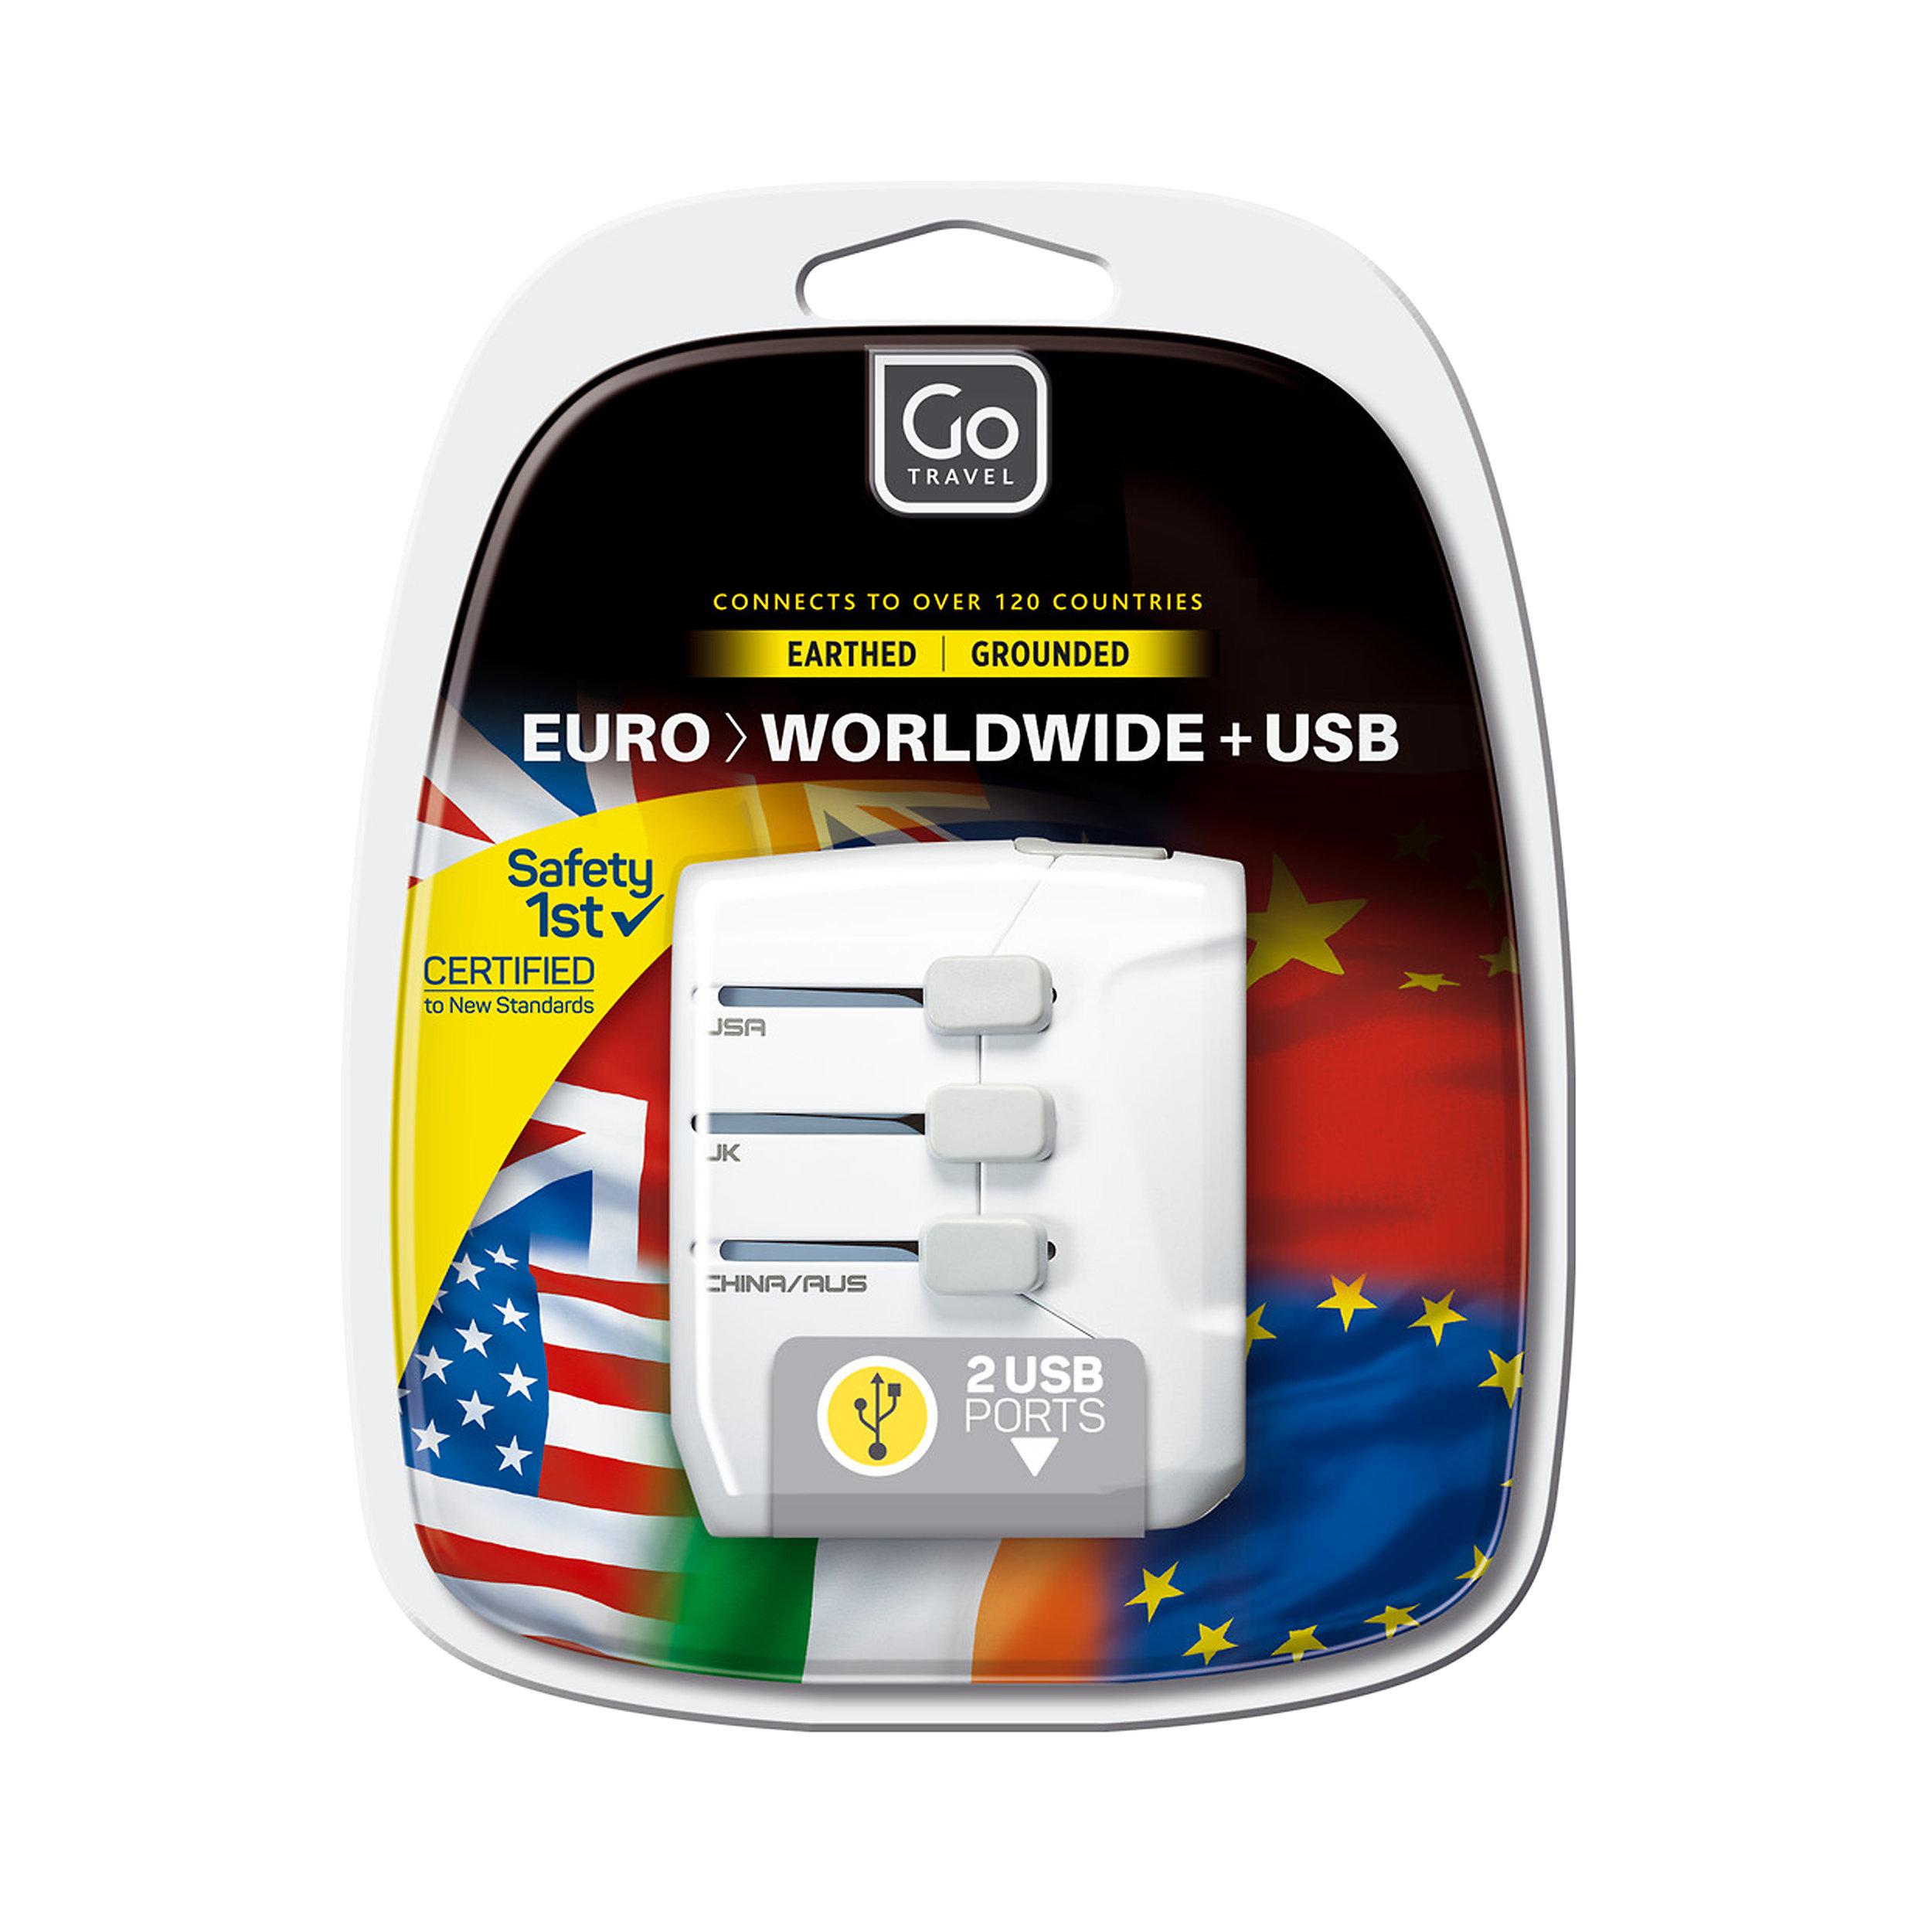 Adaptor EU/worldwide + USB